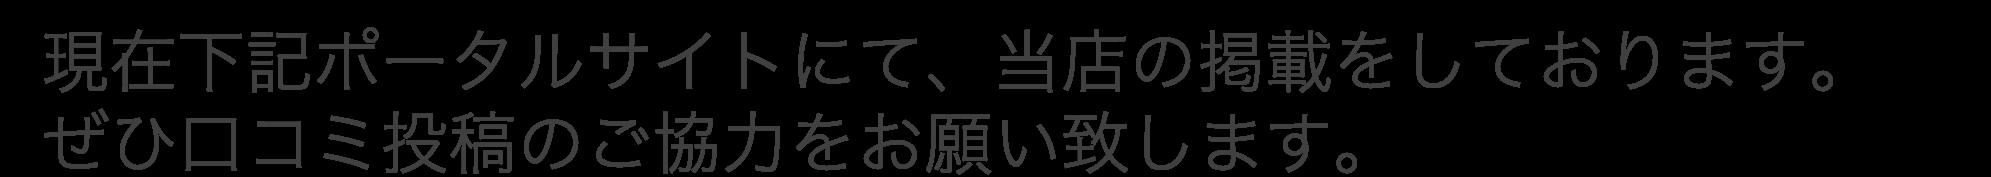 本文-口コミ件数